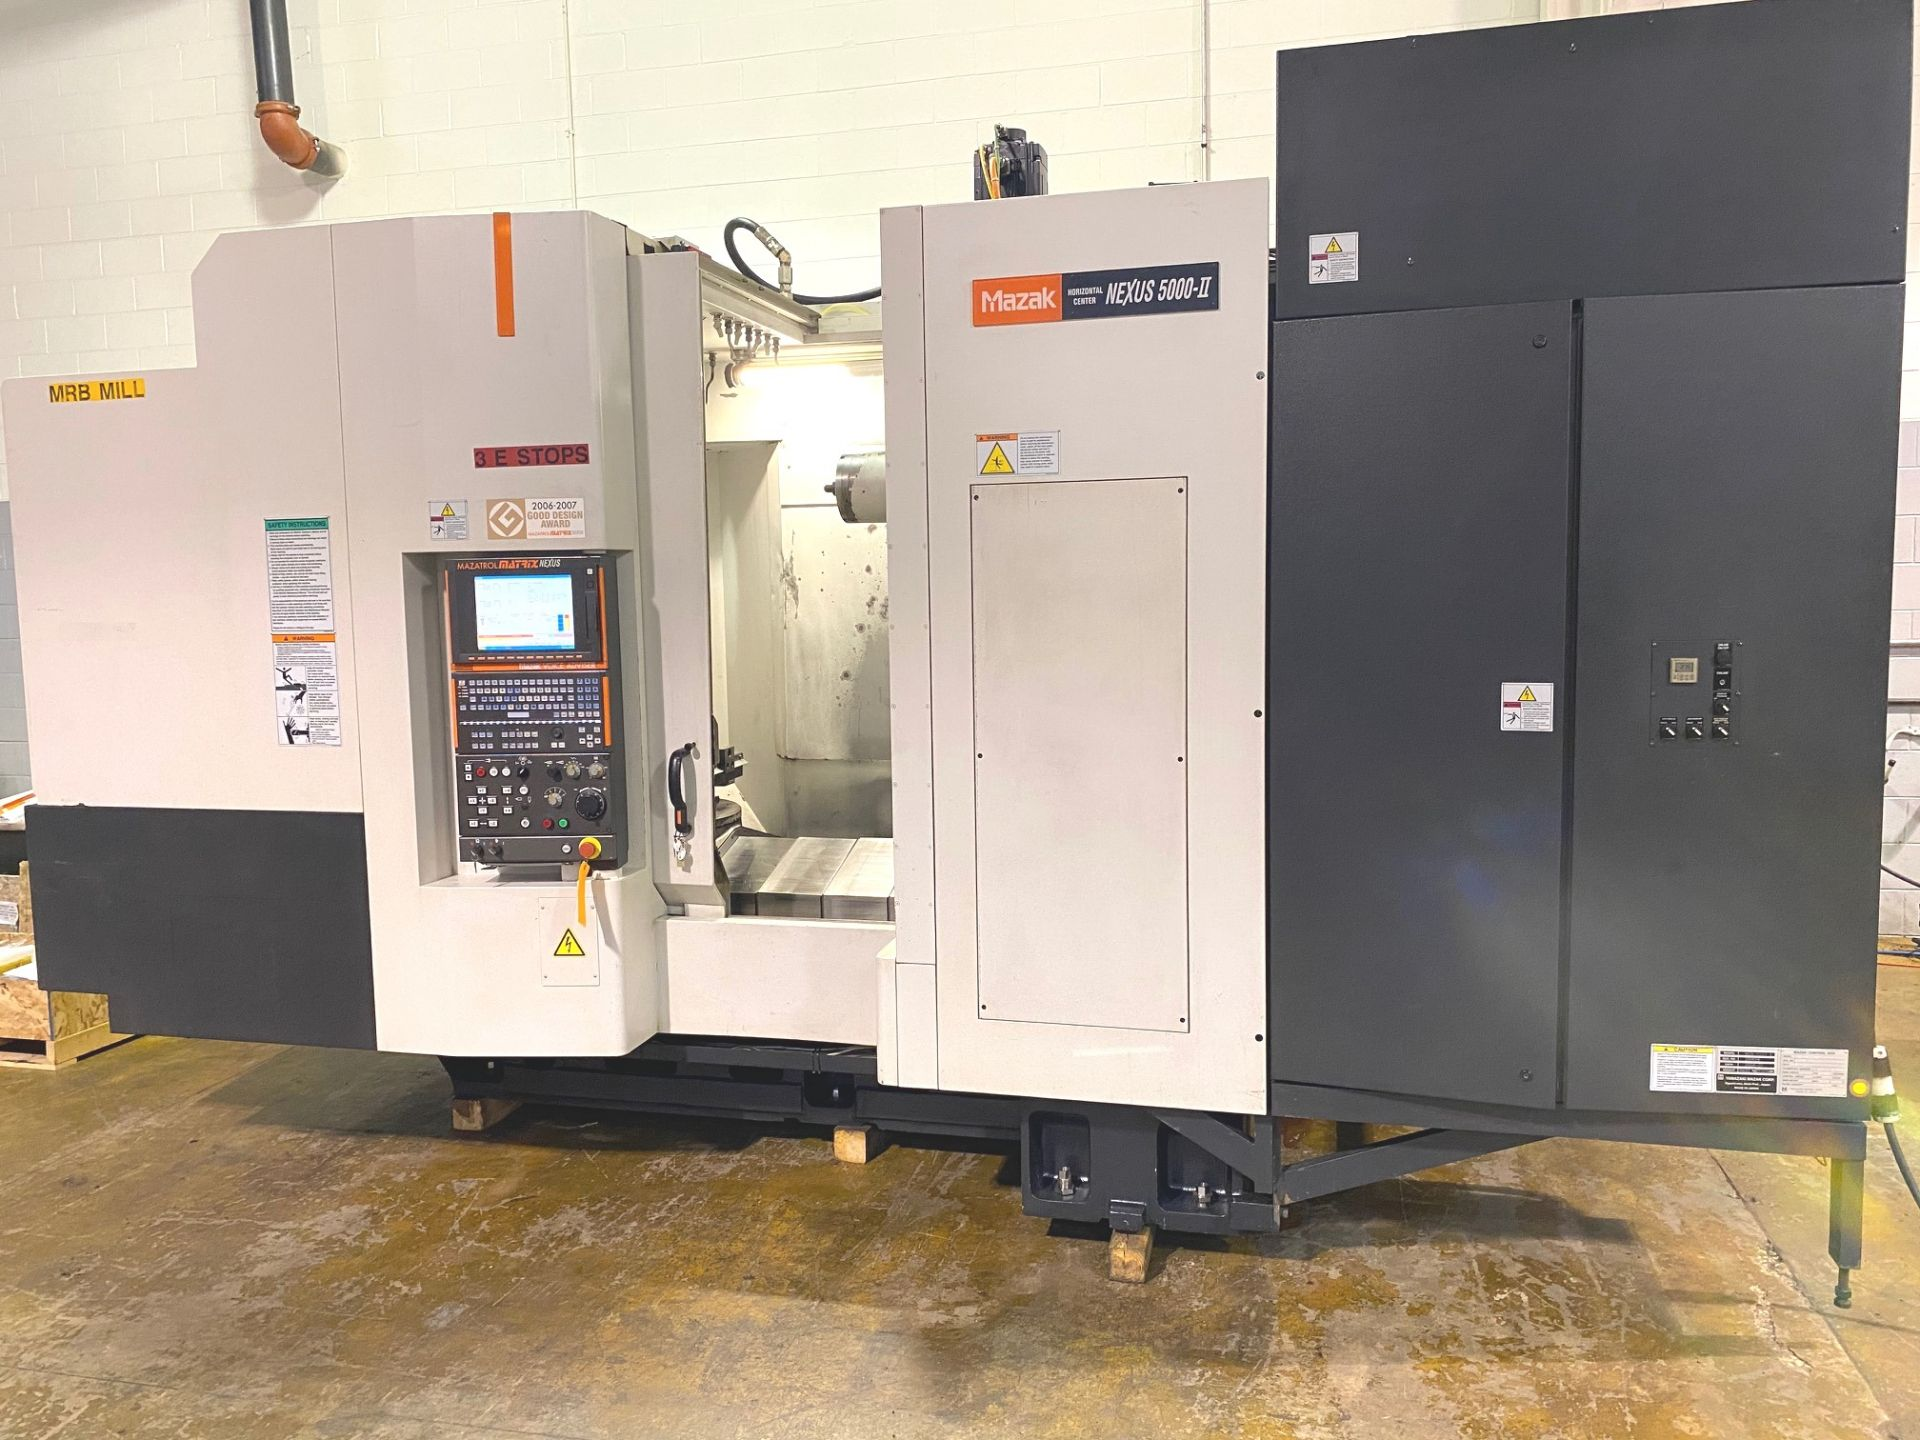 Lot 32 - Mazak Nexus HCN 5000 II CNC Horizontal Machining Center